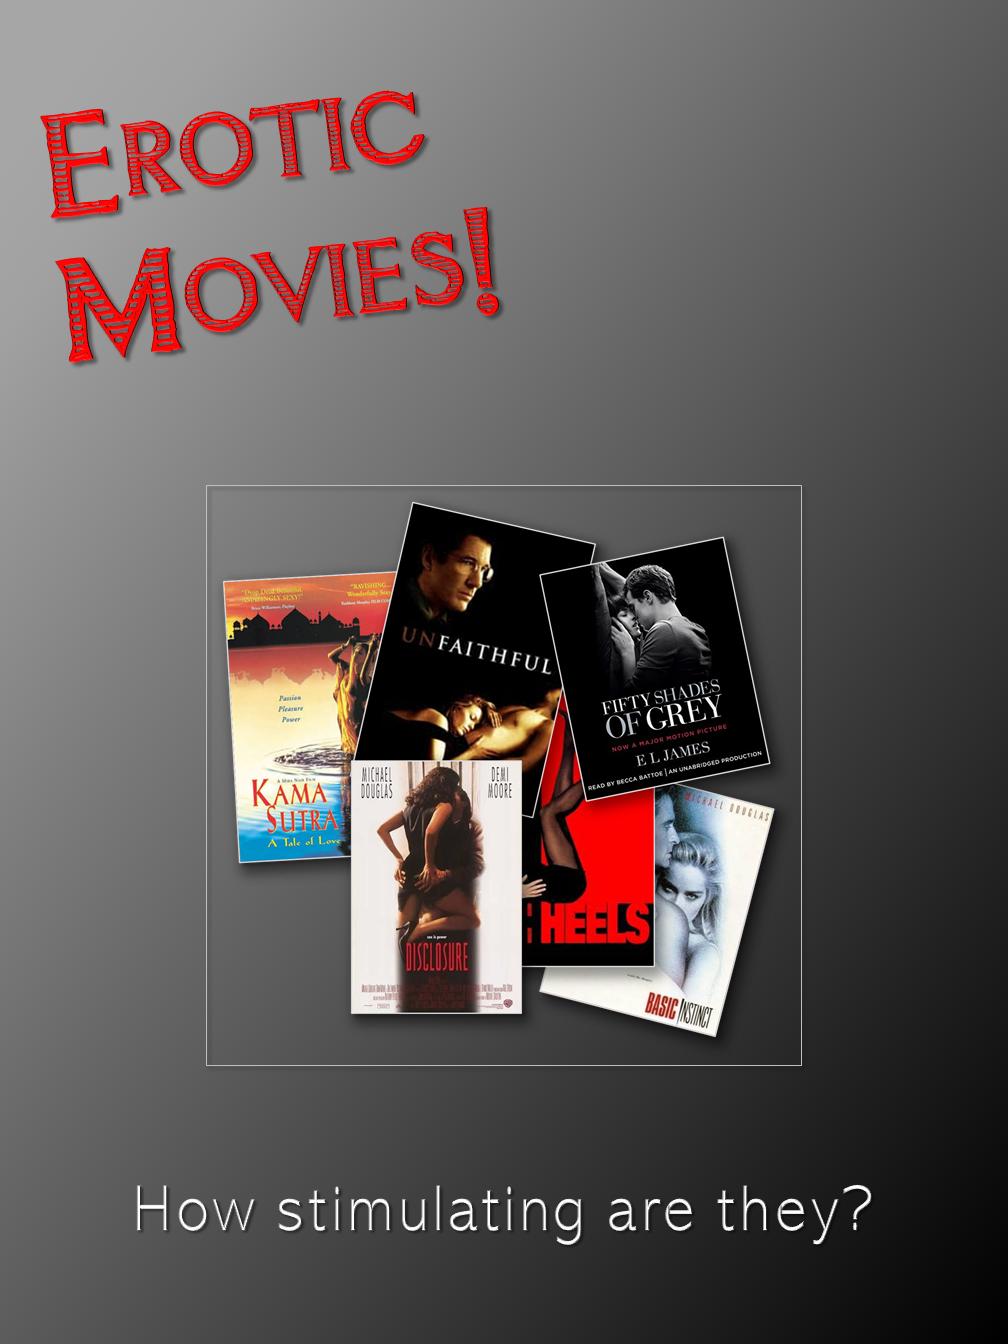 Erotic Movies!